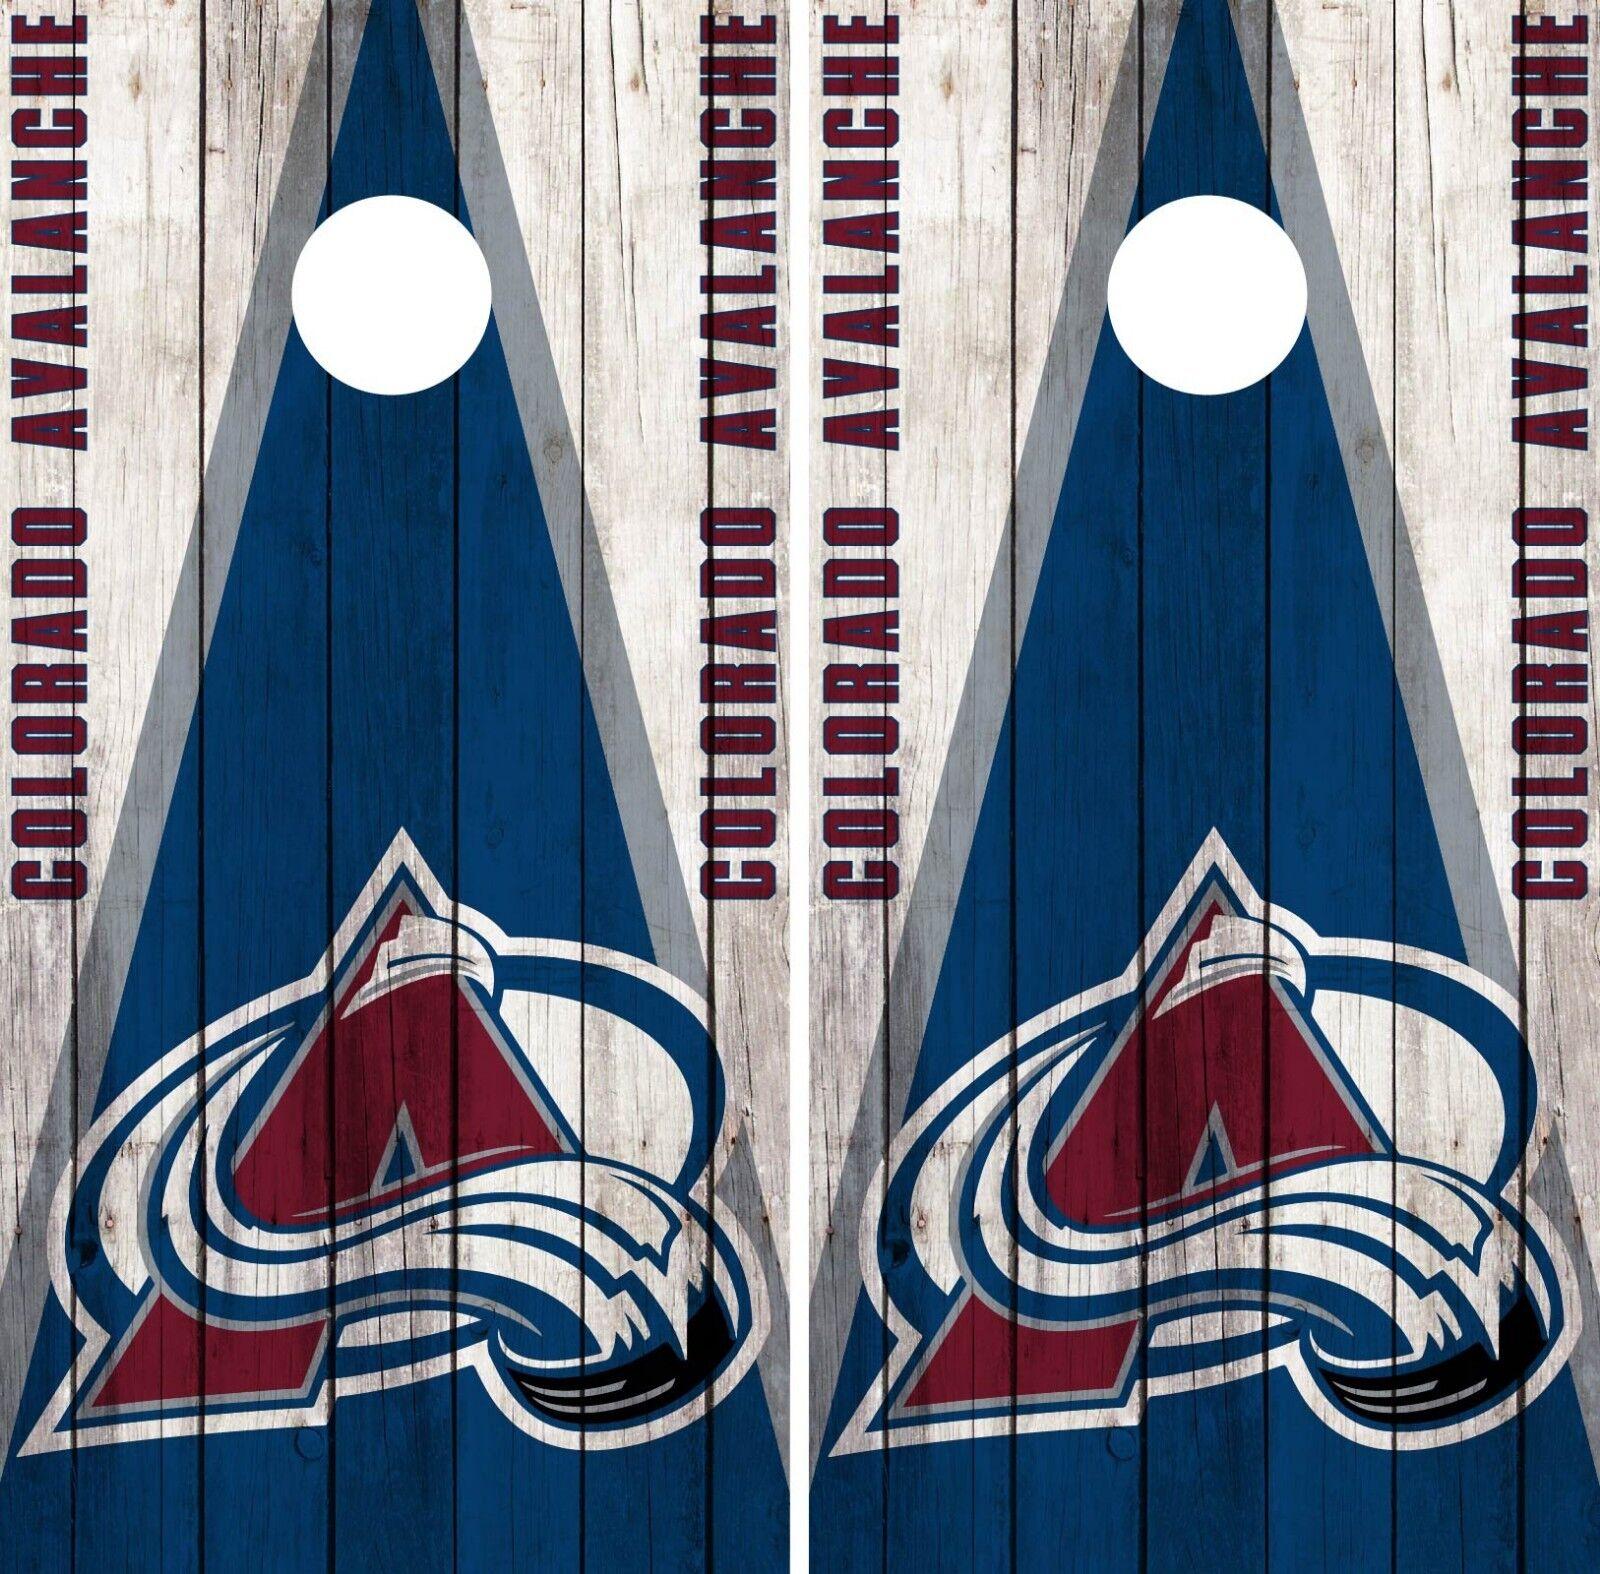 colorado Avalanche Cornhole Wrap  NHL Vintage Game Skin Set Vinyl Decal CO334  the newest brands outlet online